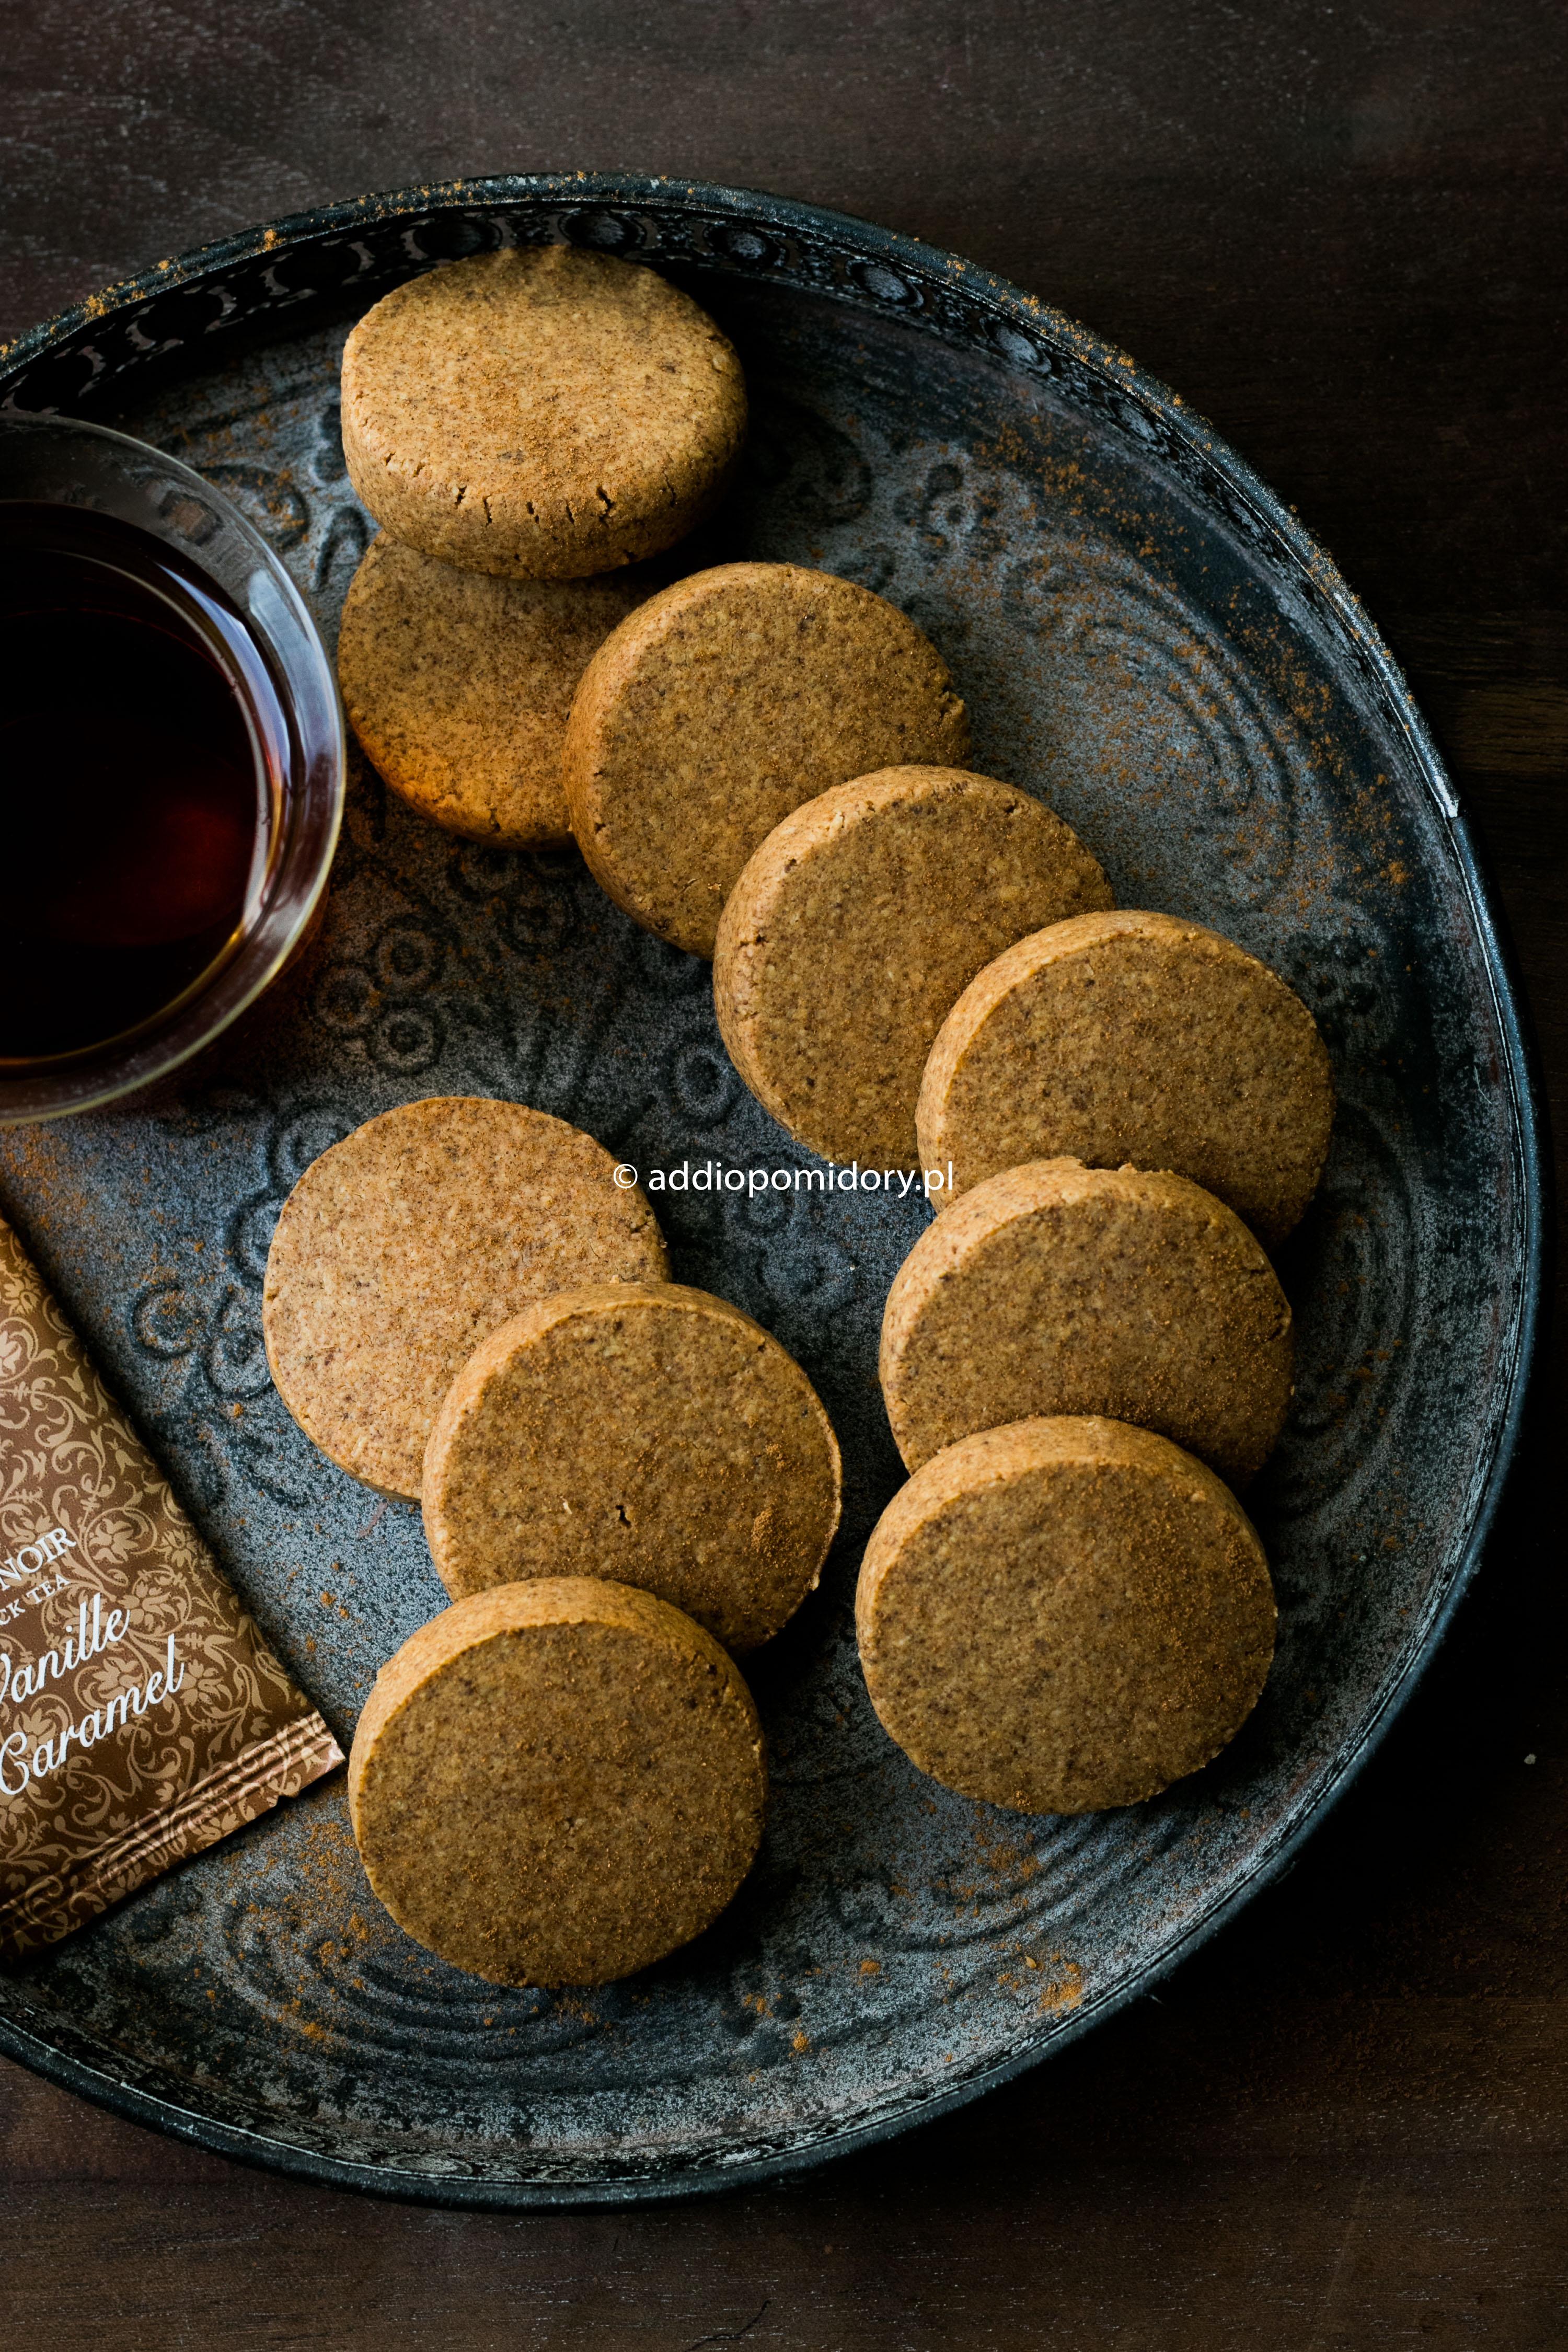 Ciasteczka Addiopomidory